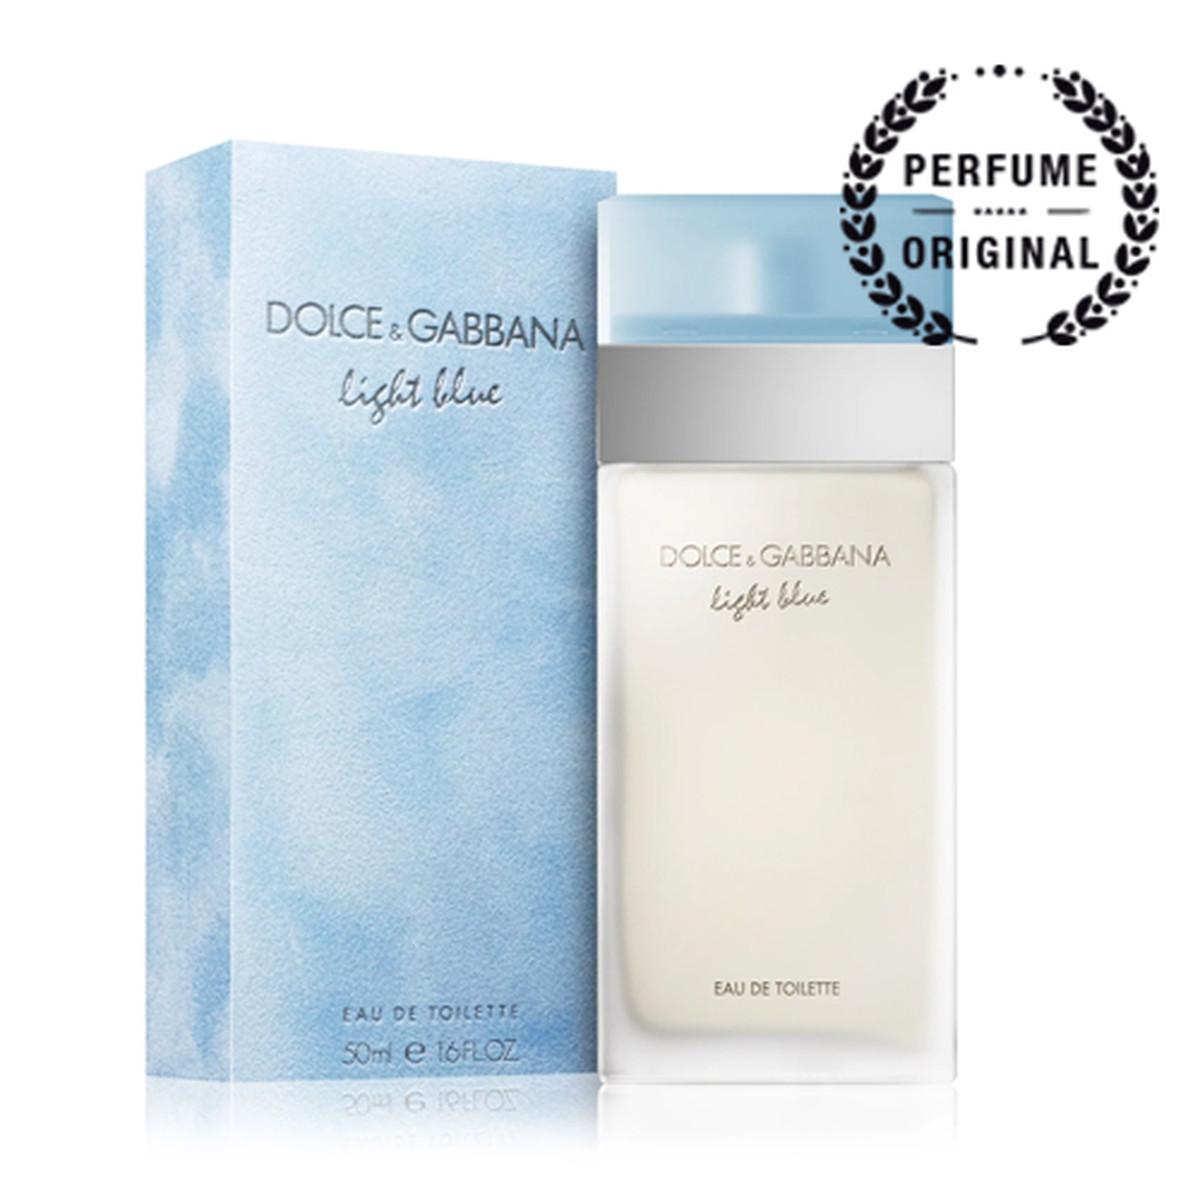 dolce gabbana light blue eau de toilette vaporizador 50ml. Black Bedroom Furniture Sets. Home Design Ideas